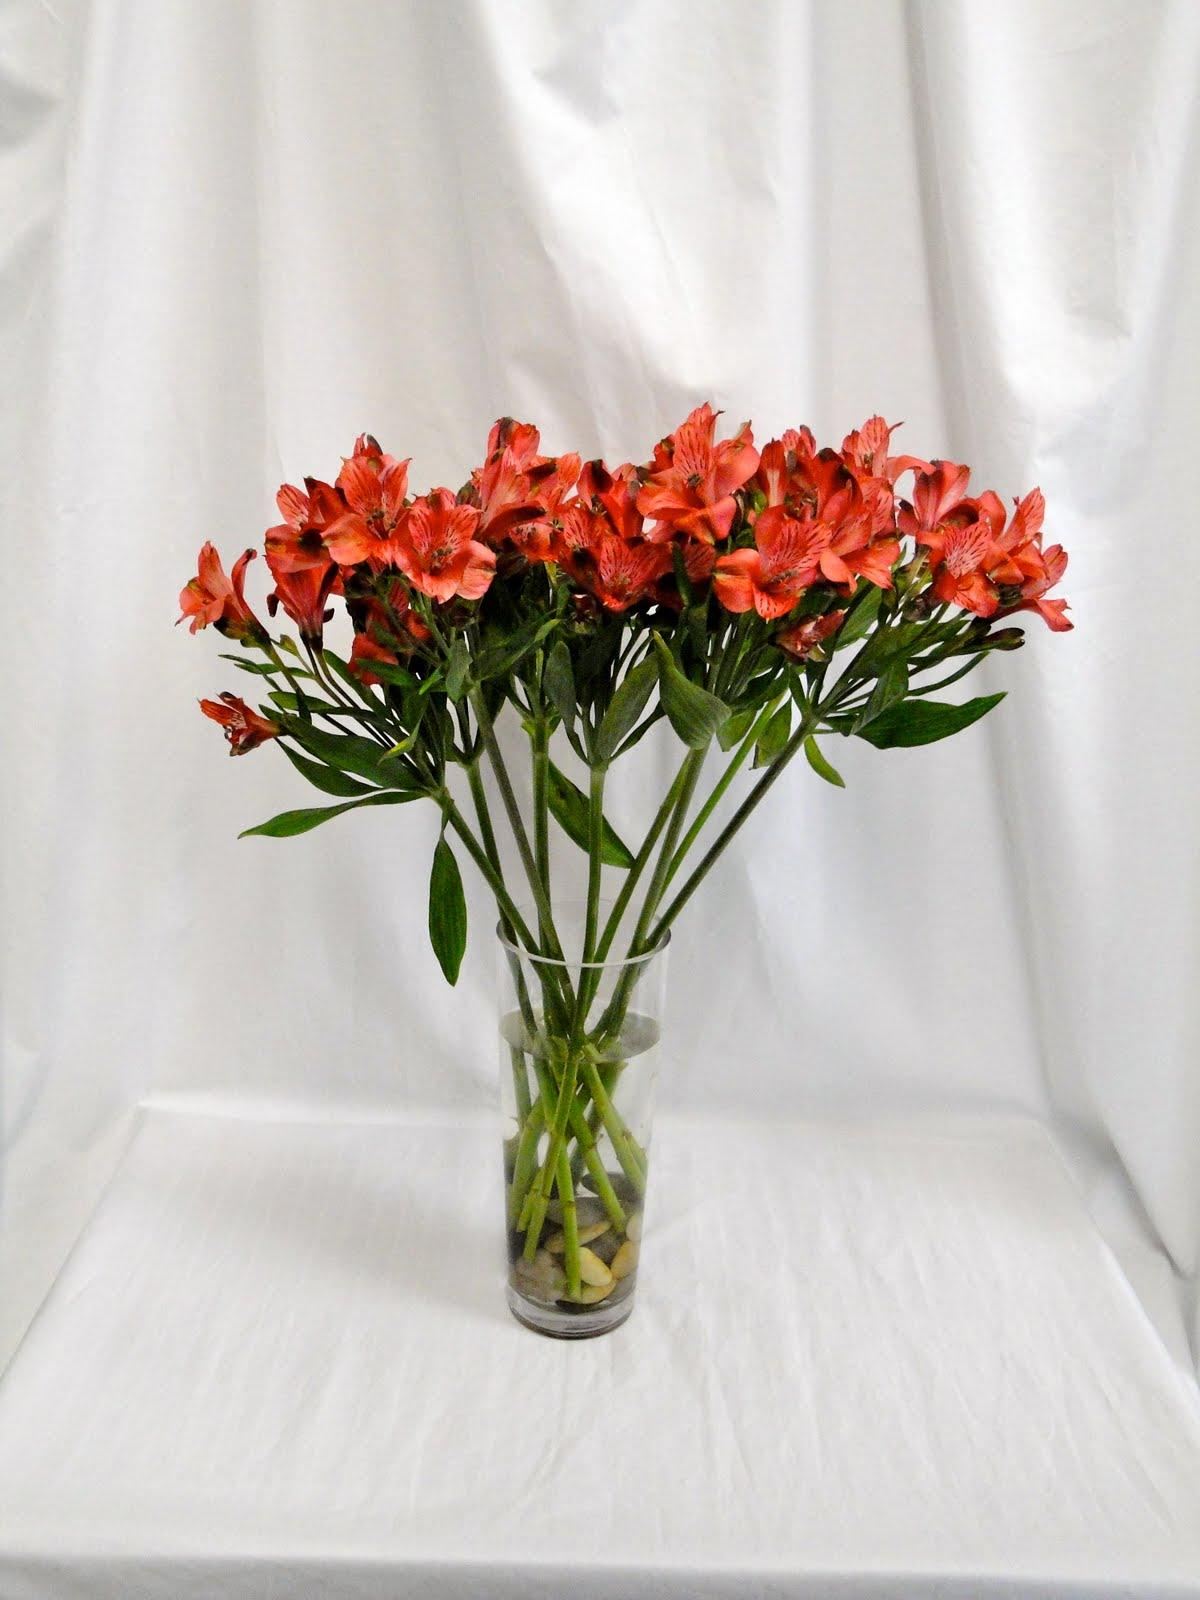 Bell Flowers Alstroemeria Test Day Eight Bell Flowers Blog